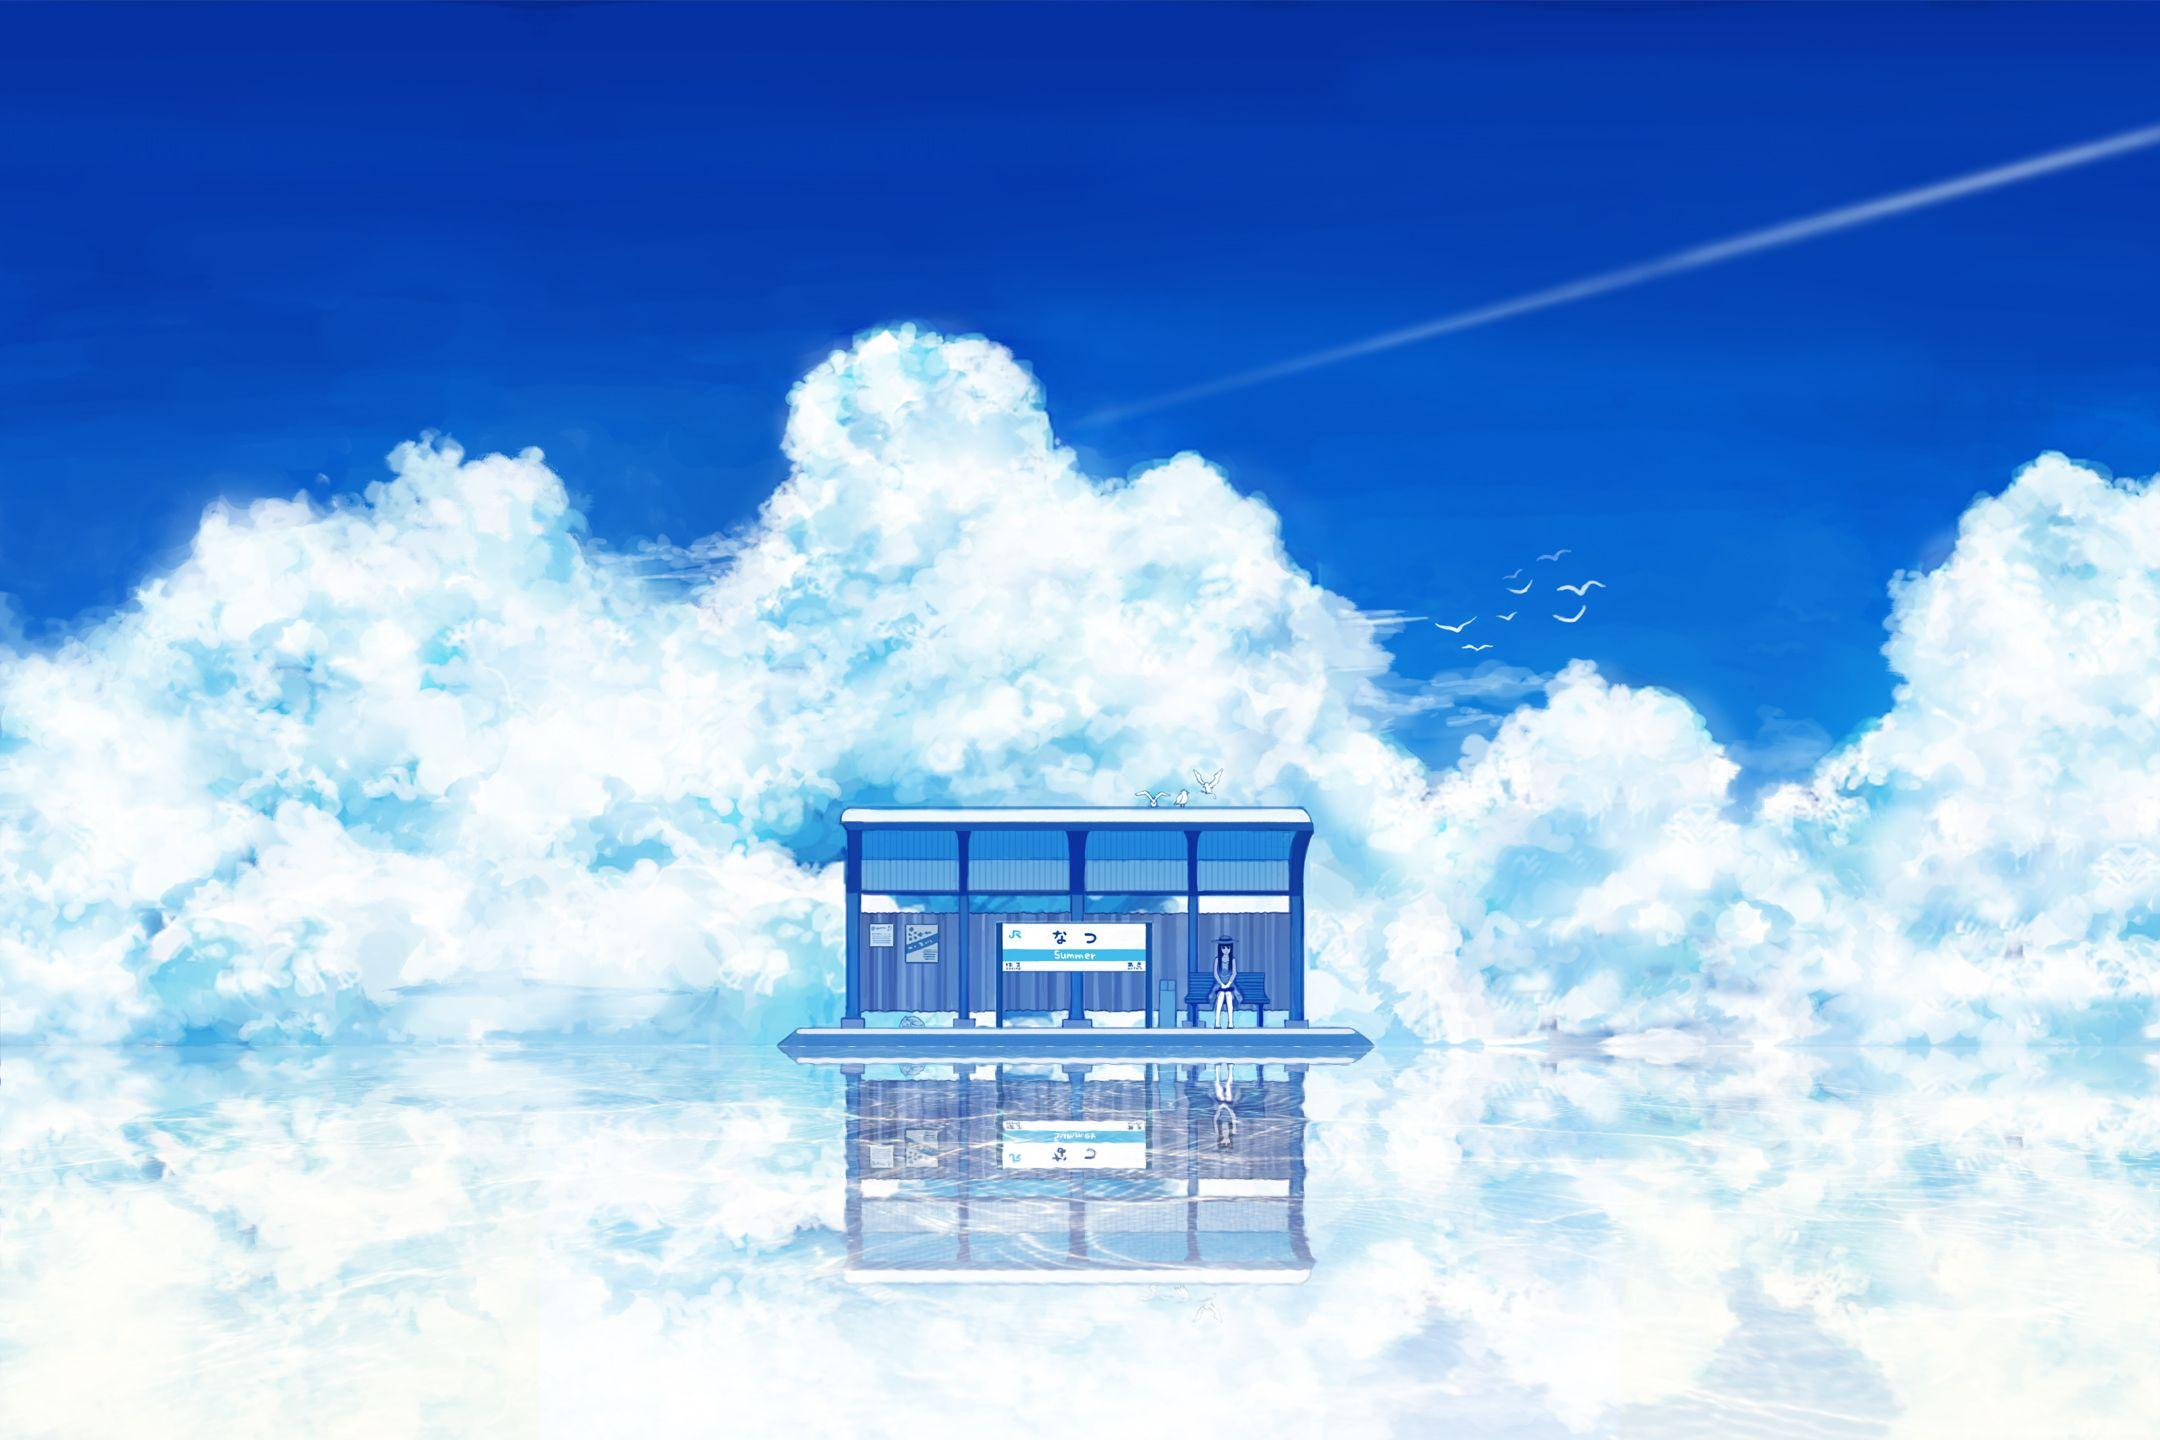 landscape anime wallpaper